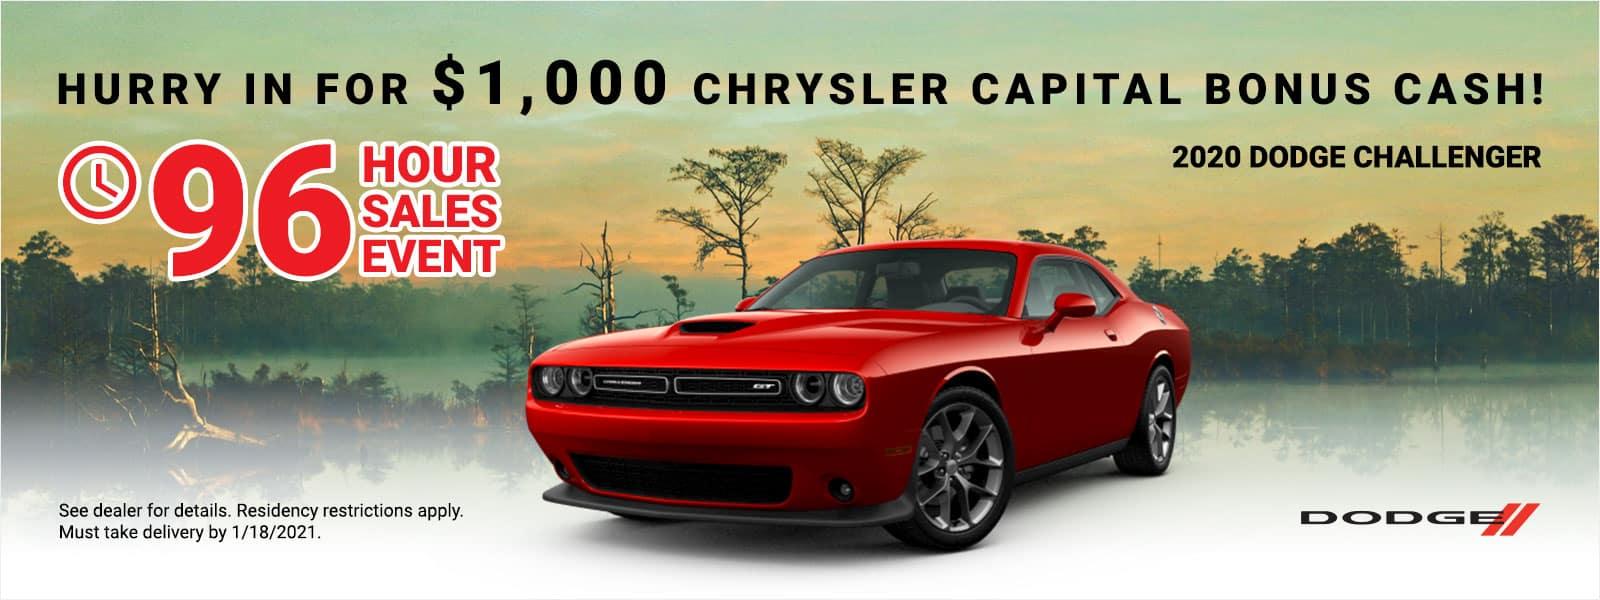 SEBC_Banners_1600x600_2021-01_517961_2020-Dodge-Challenger